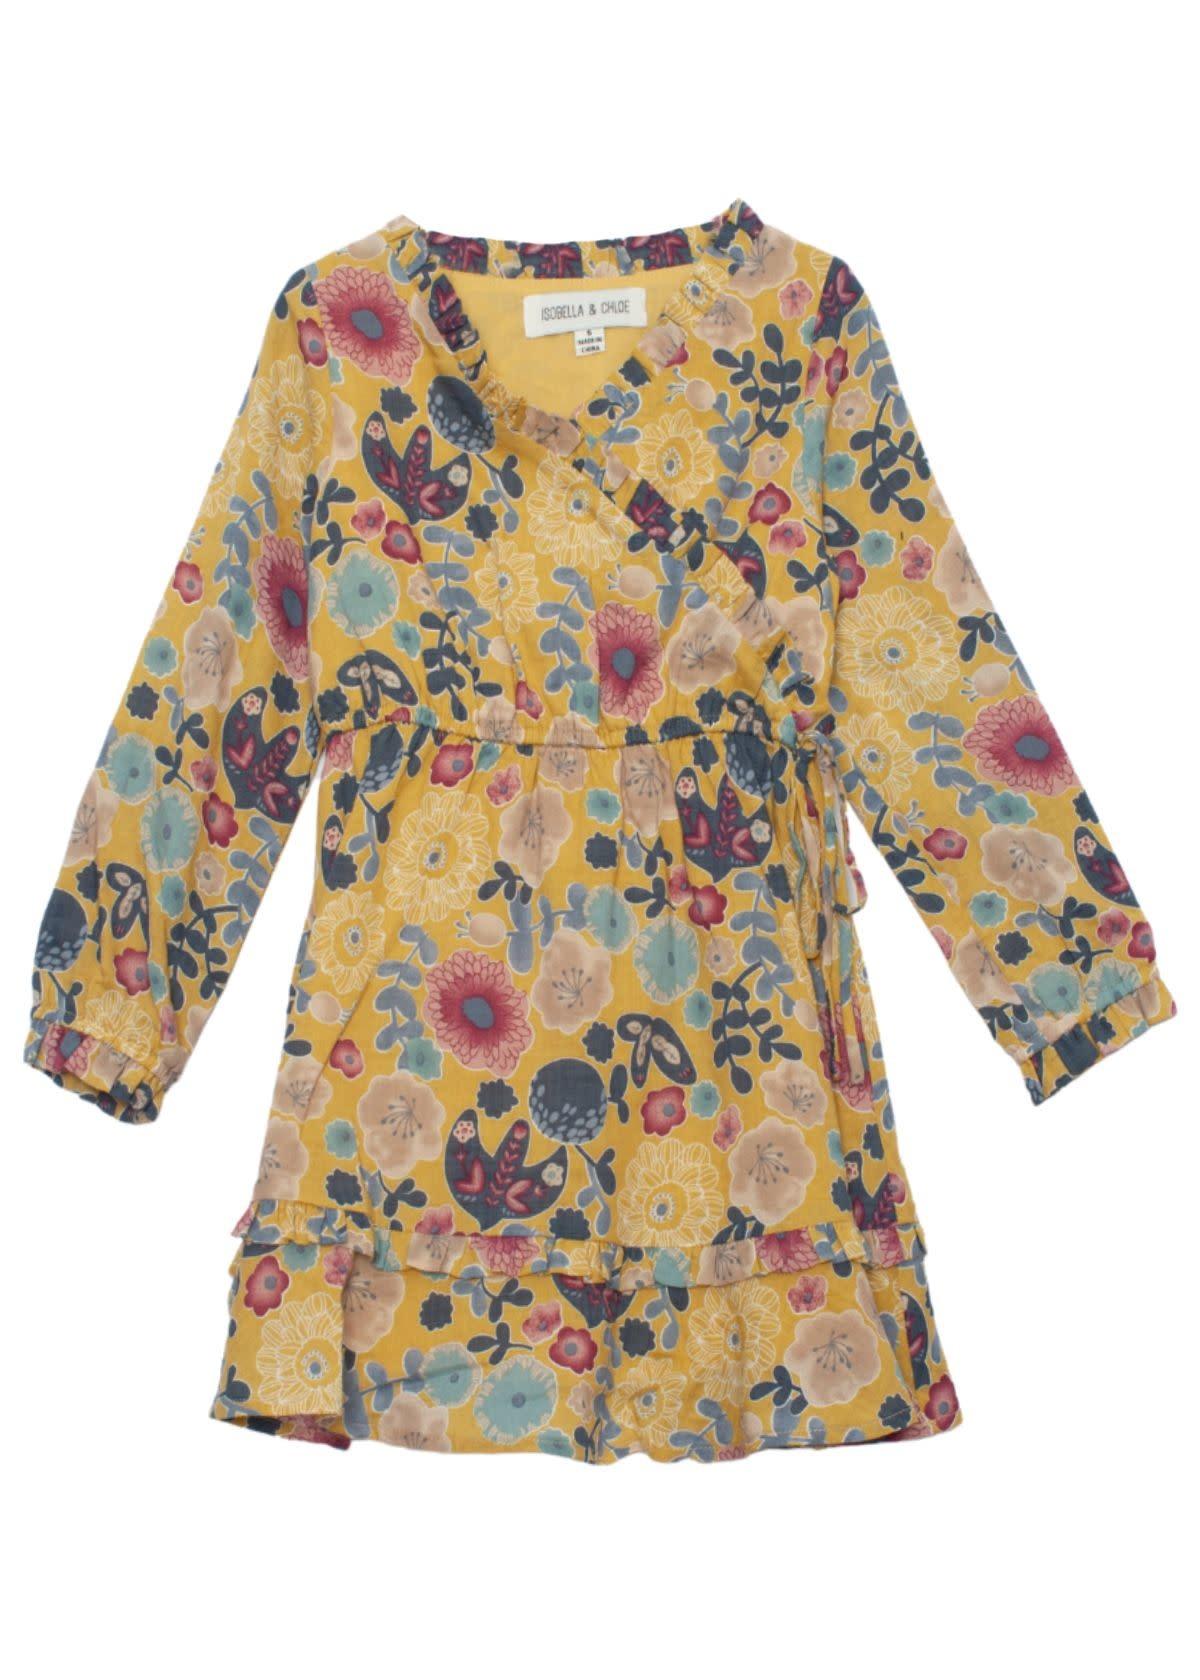 Isobella & Chloe Zen Garden Floral Dress